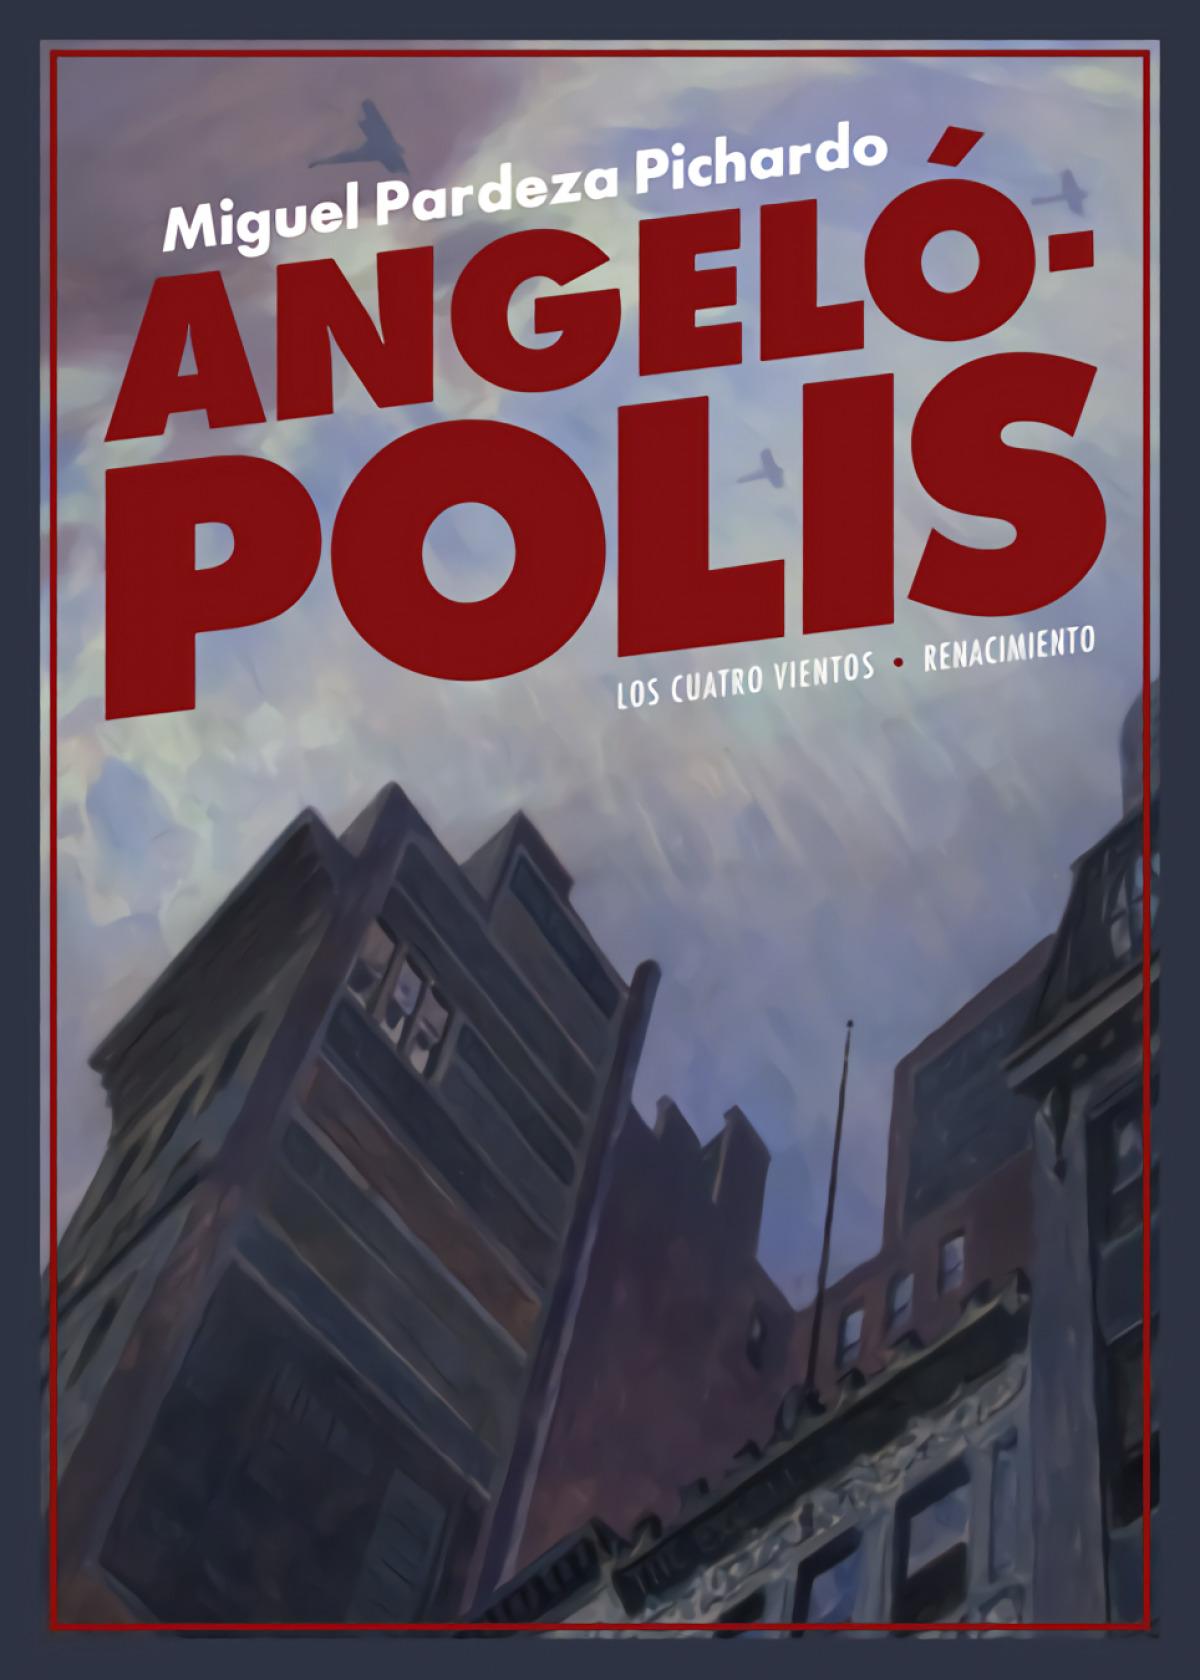 Angelópolis 9788417950743